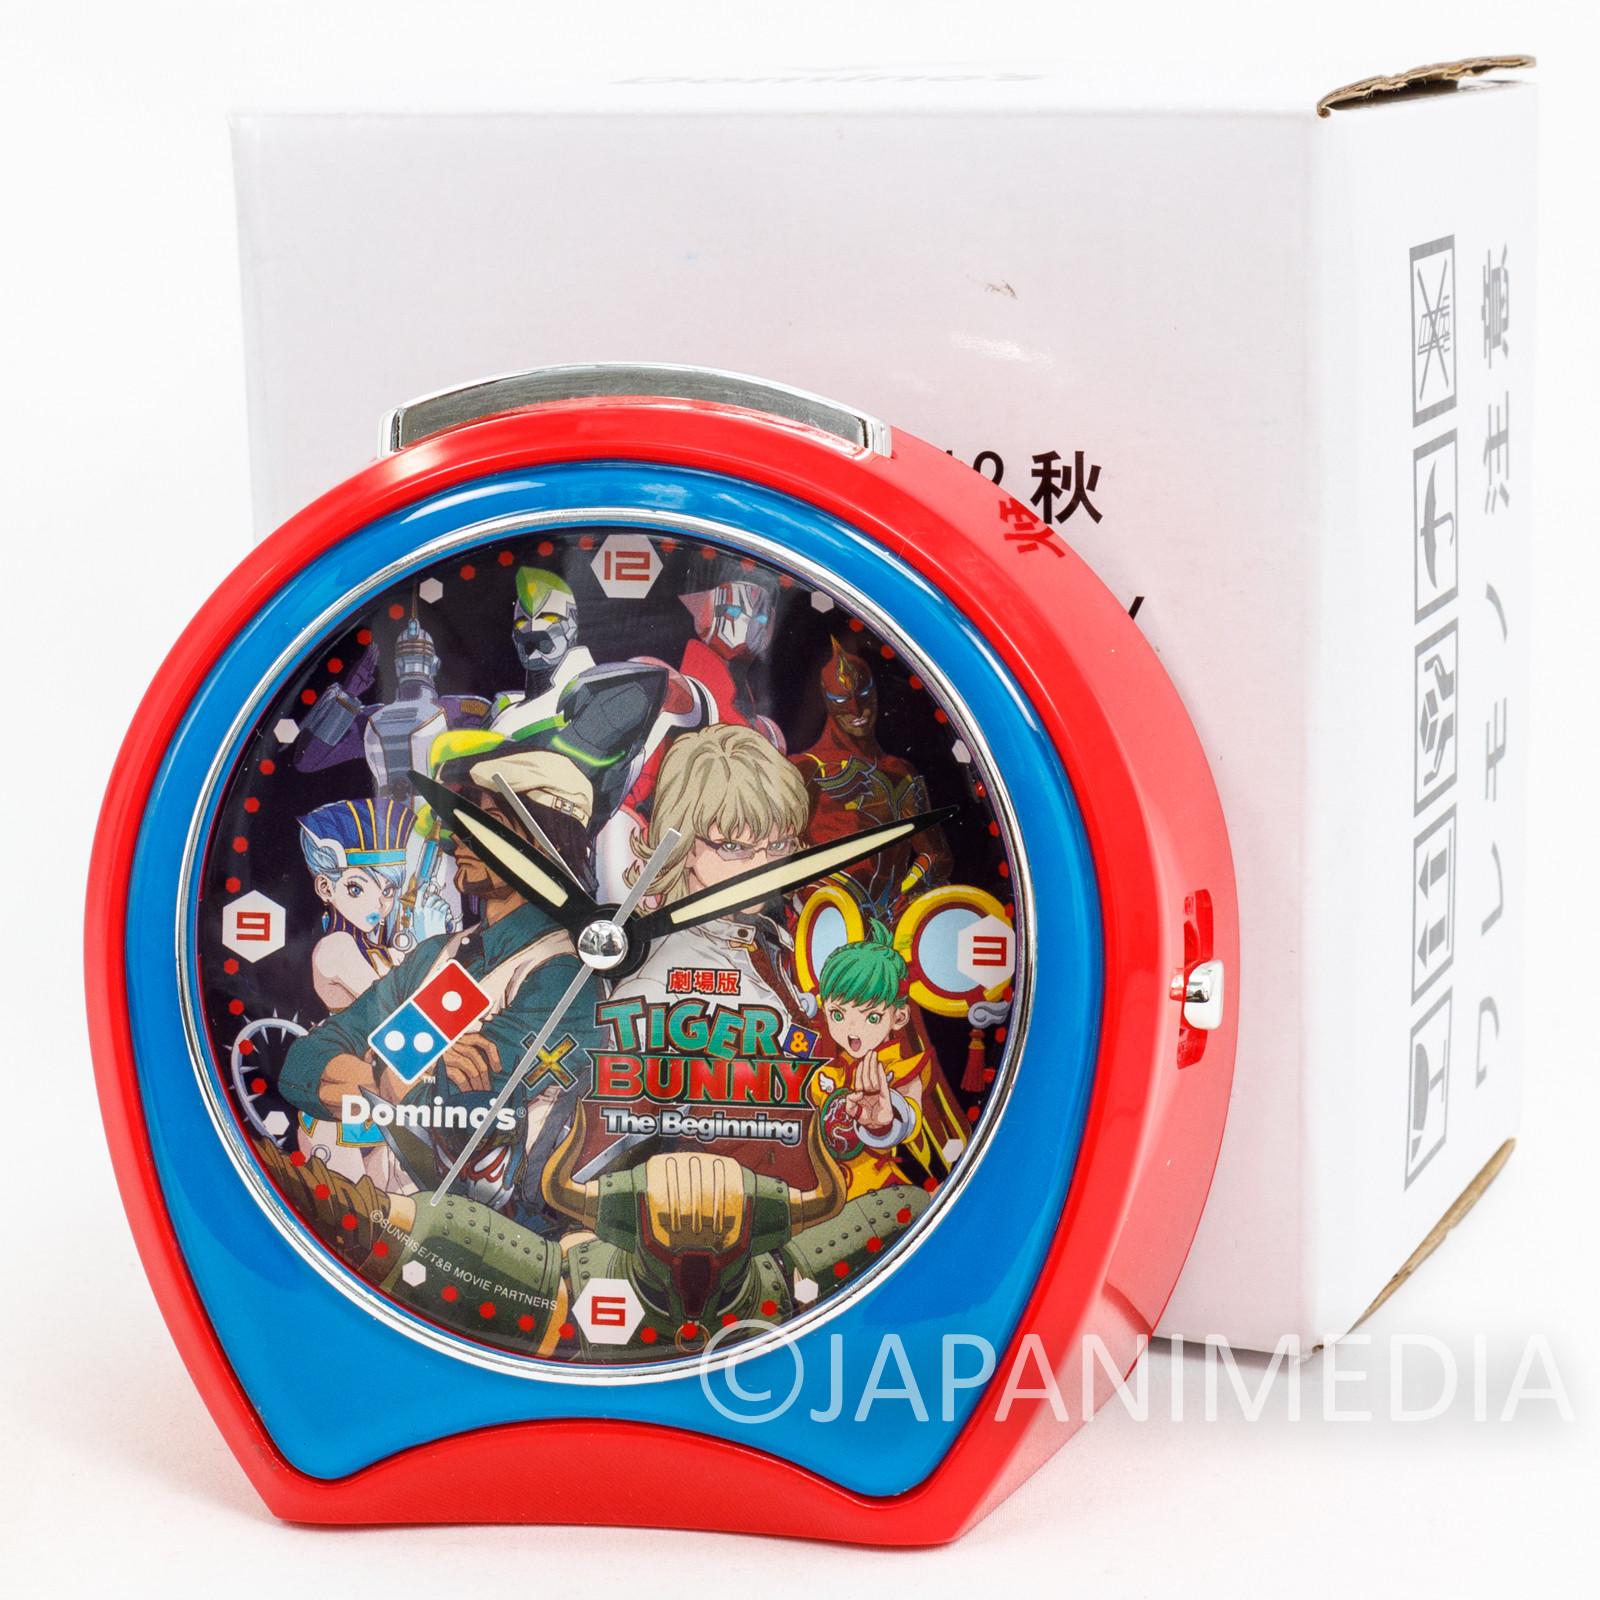 Tiger & Bunny Voice Alarm Clock Domino Pizza JAPAN ANIME